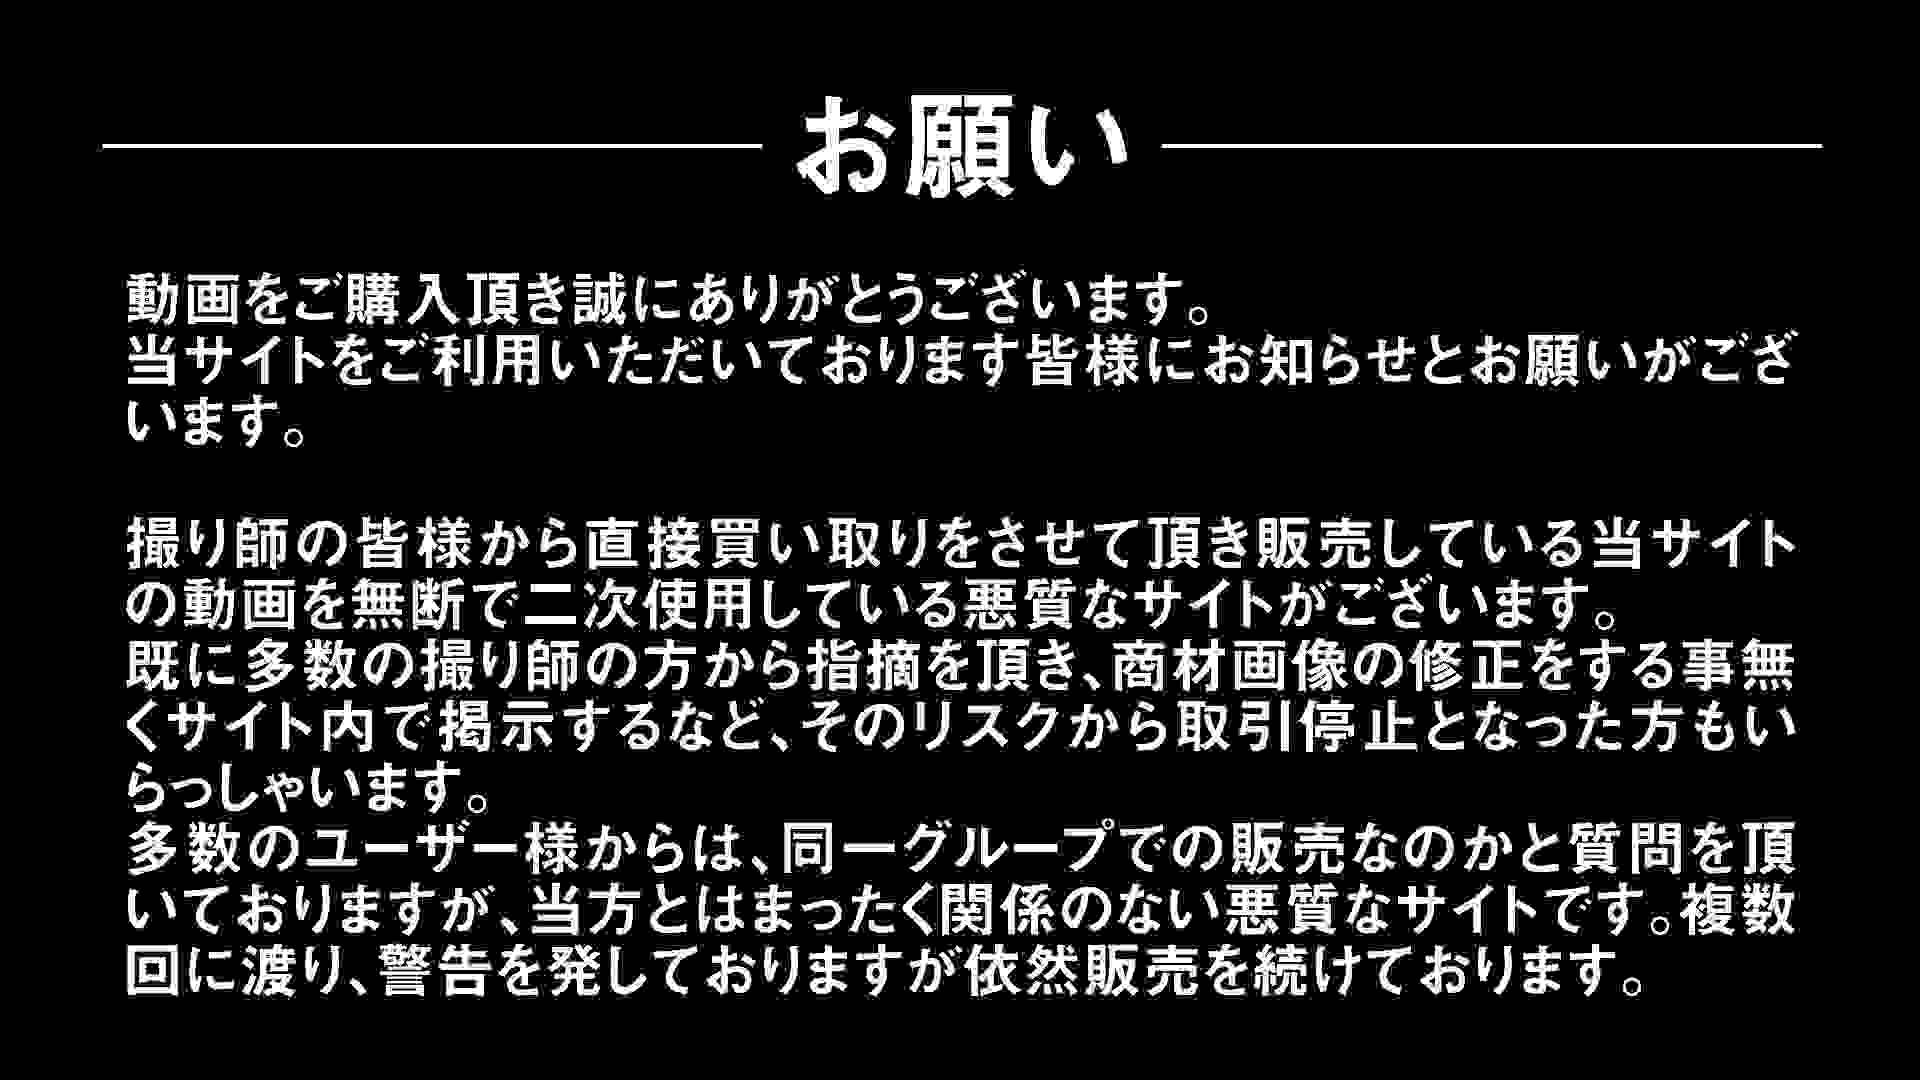 Aquaな露天風呂Vol.300 盗撮  83連発 21